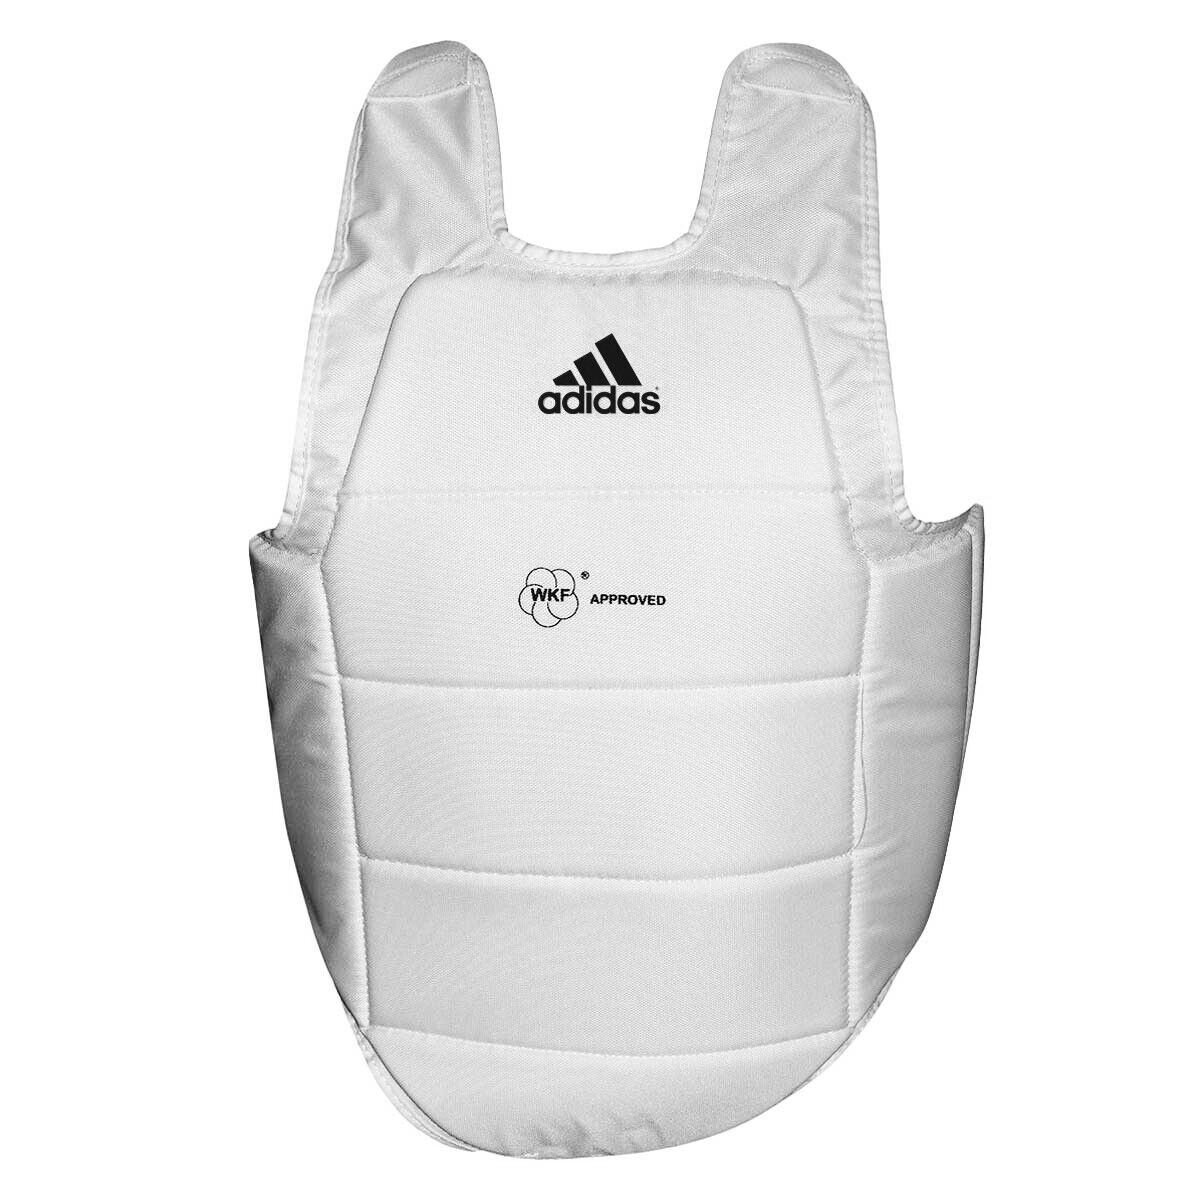 Corpetto prossoettivo Karate Omologato WKF bianca Adidas  35402070